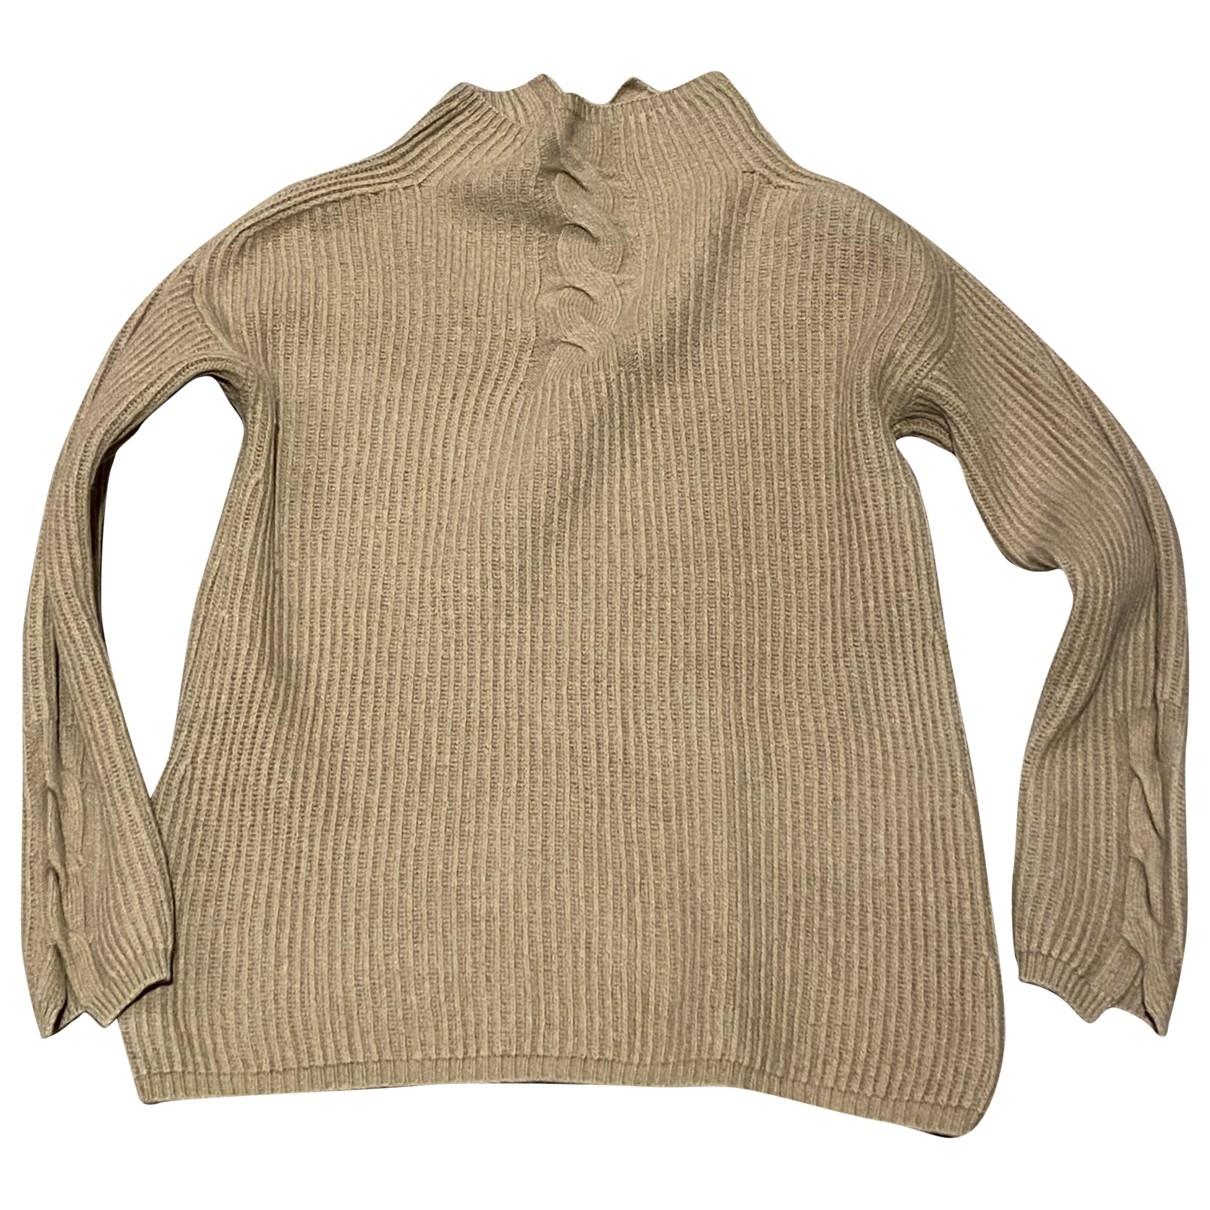 Max Mara 's \N Camel Cashmere Knitwear for Women M International